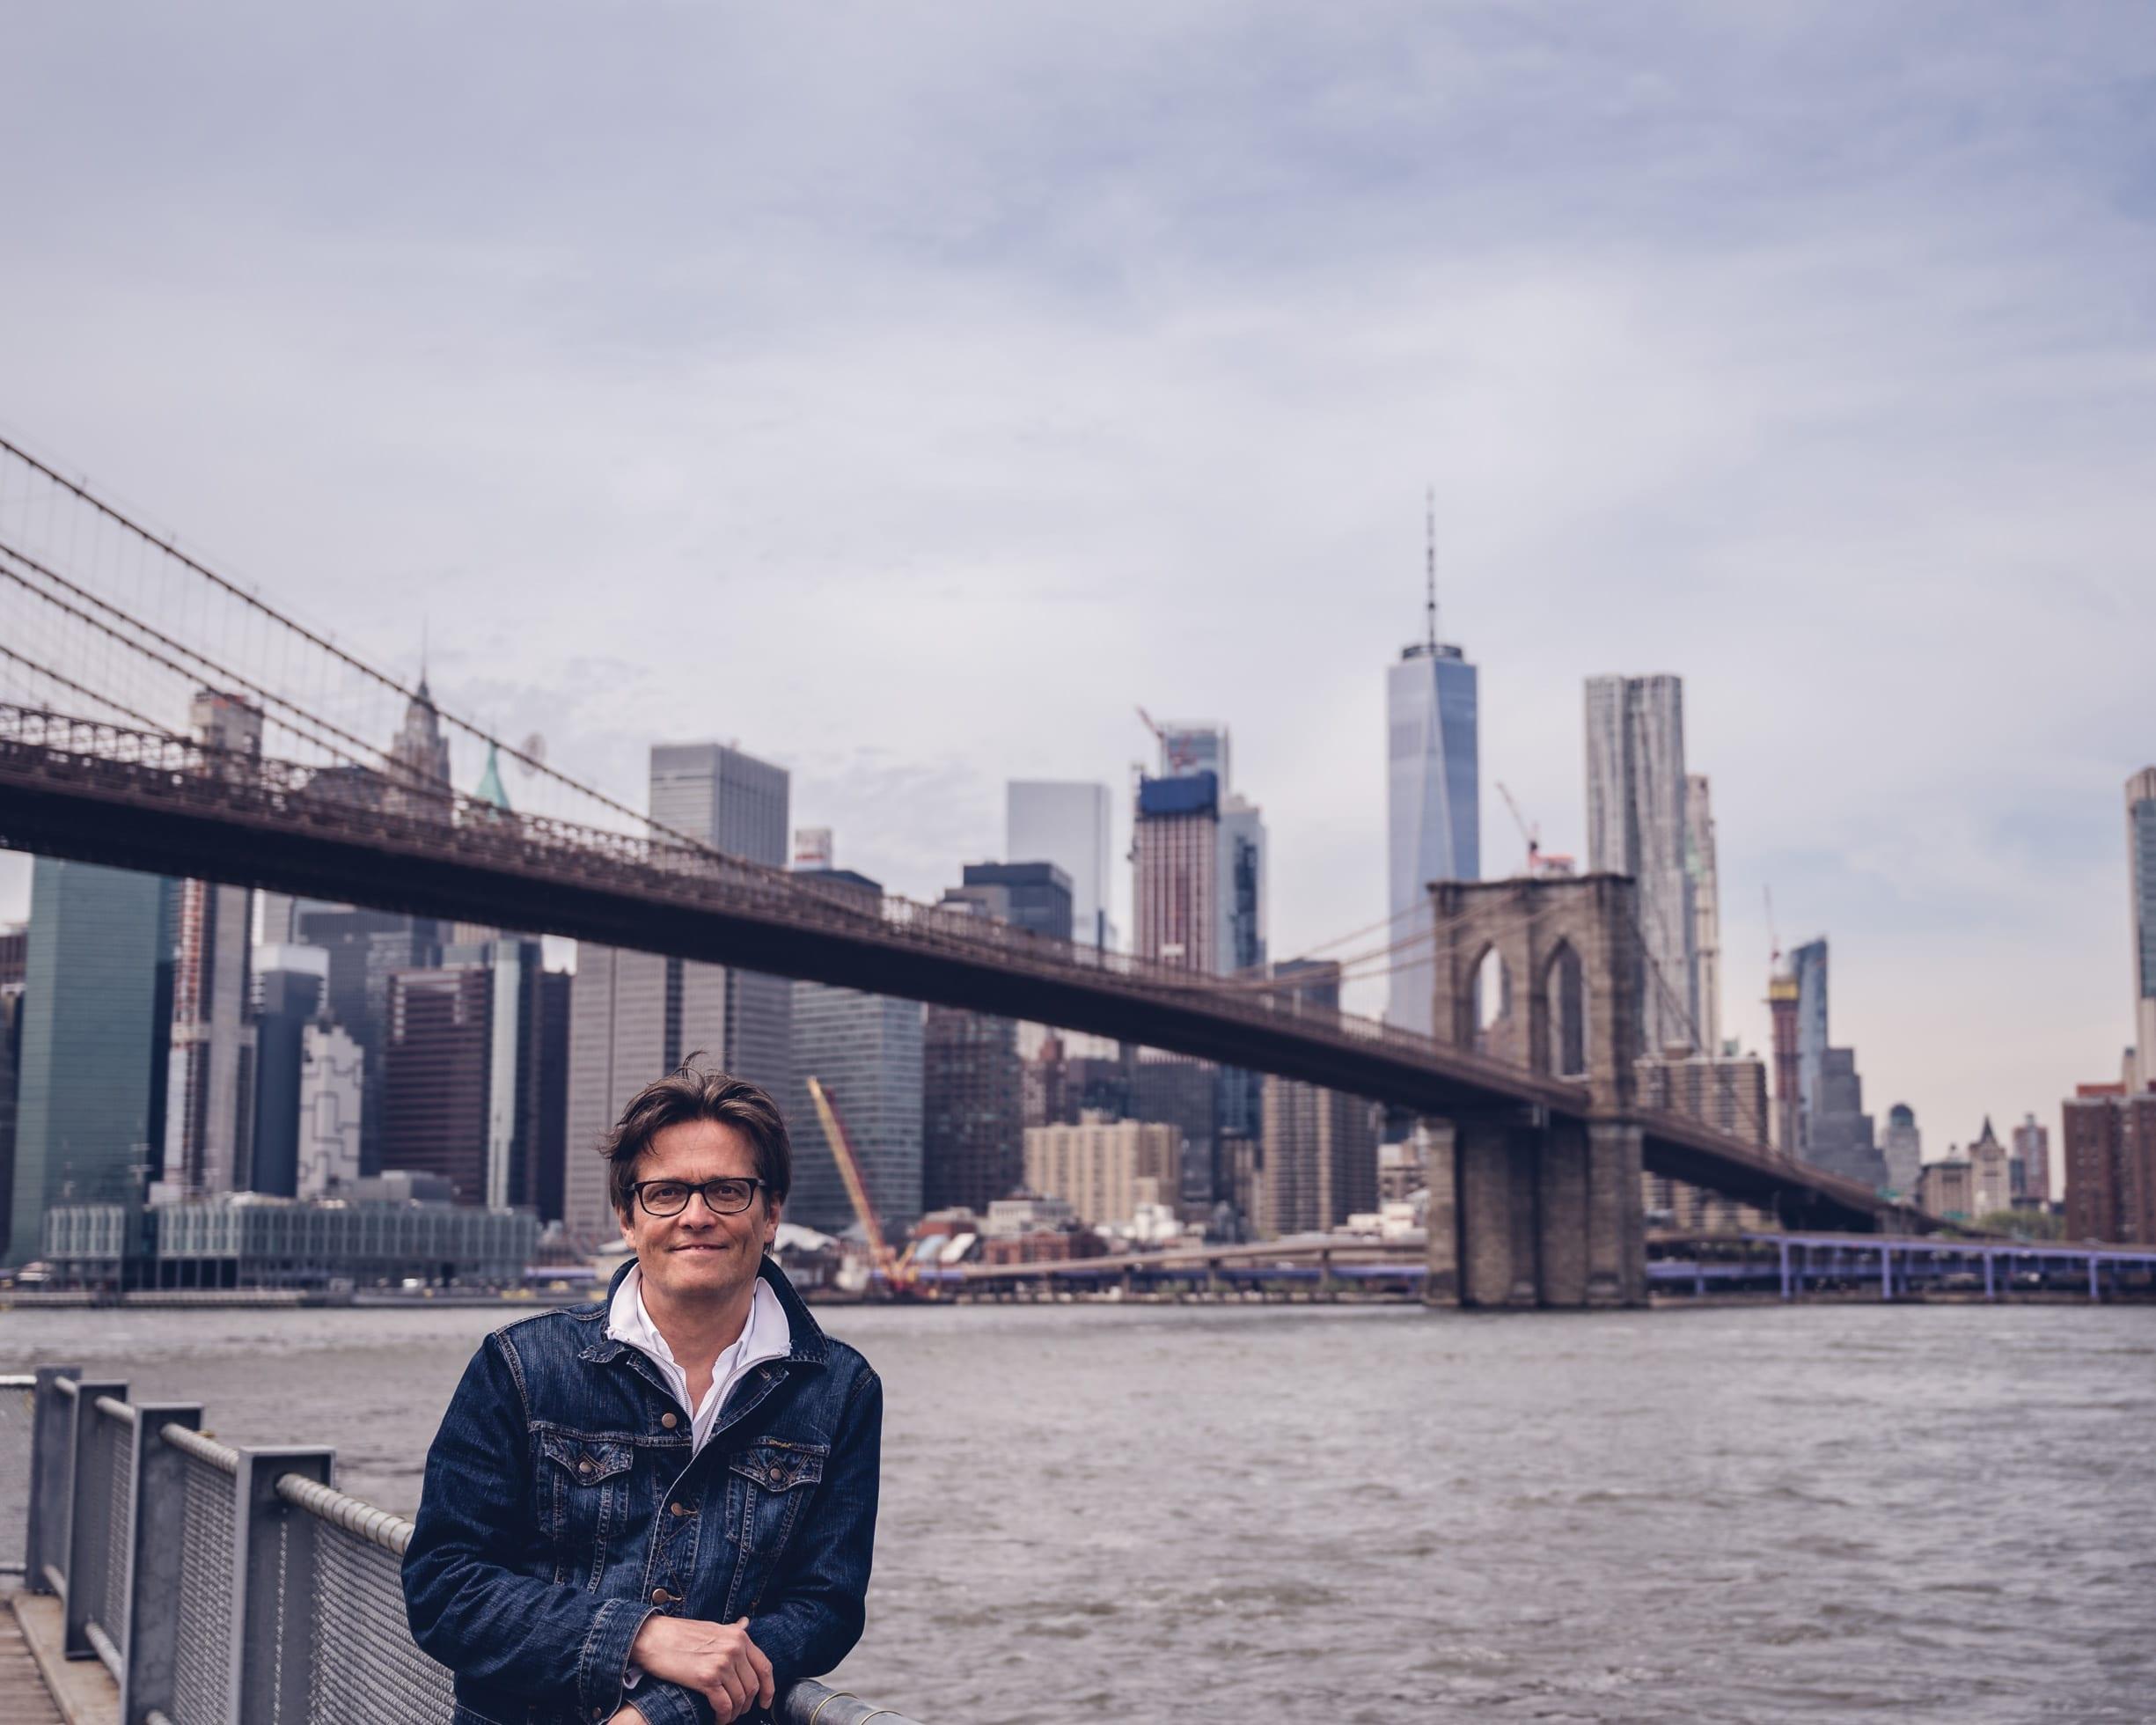 Fotograf Roland Dutzler in New York